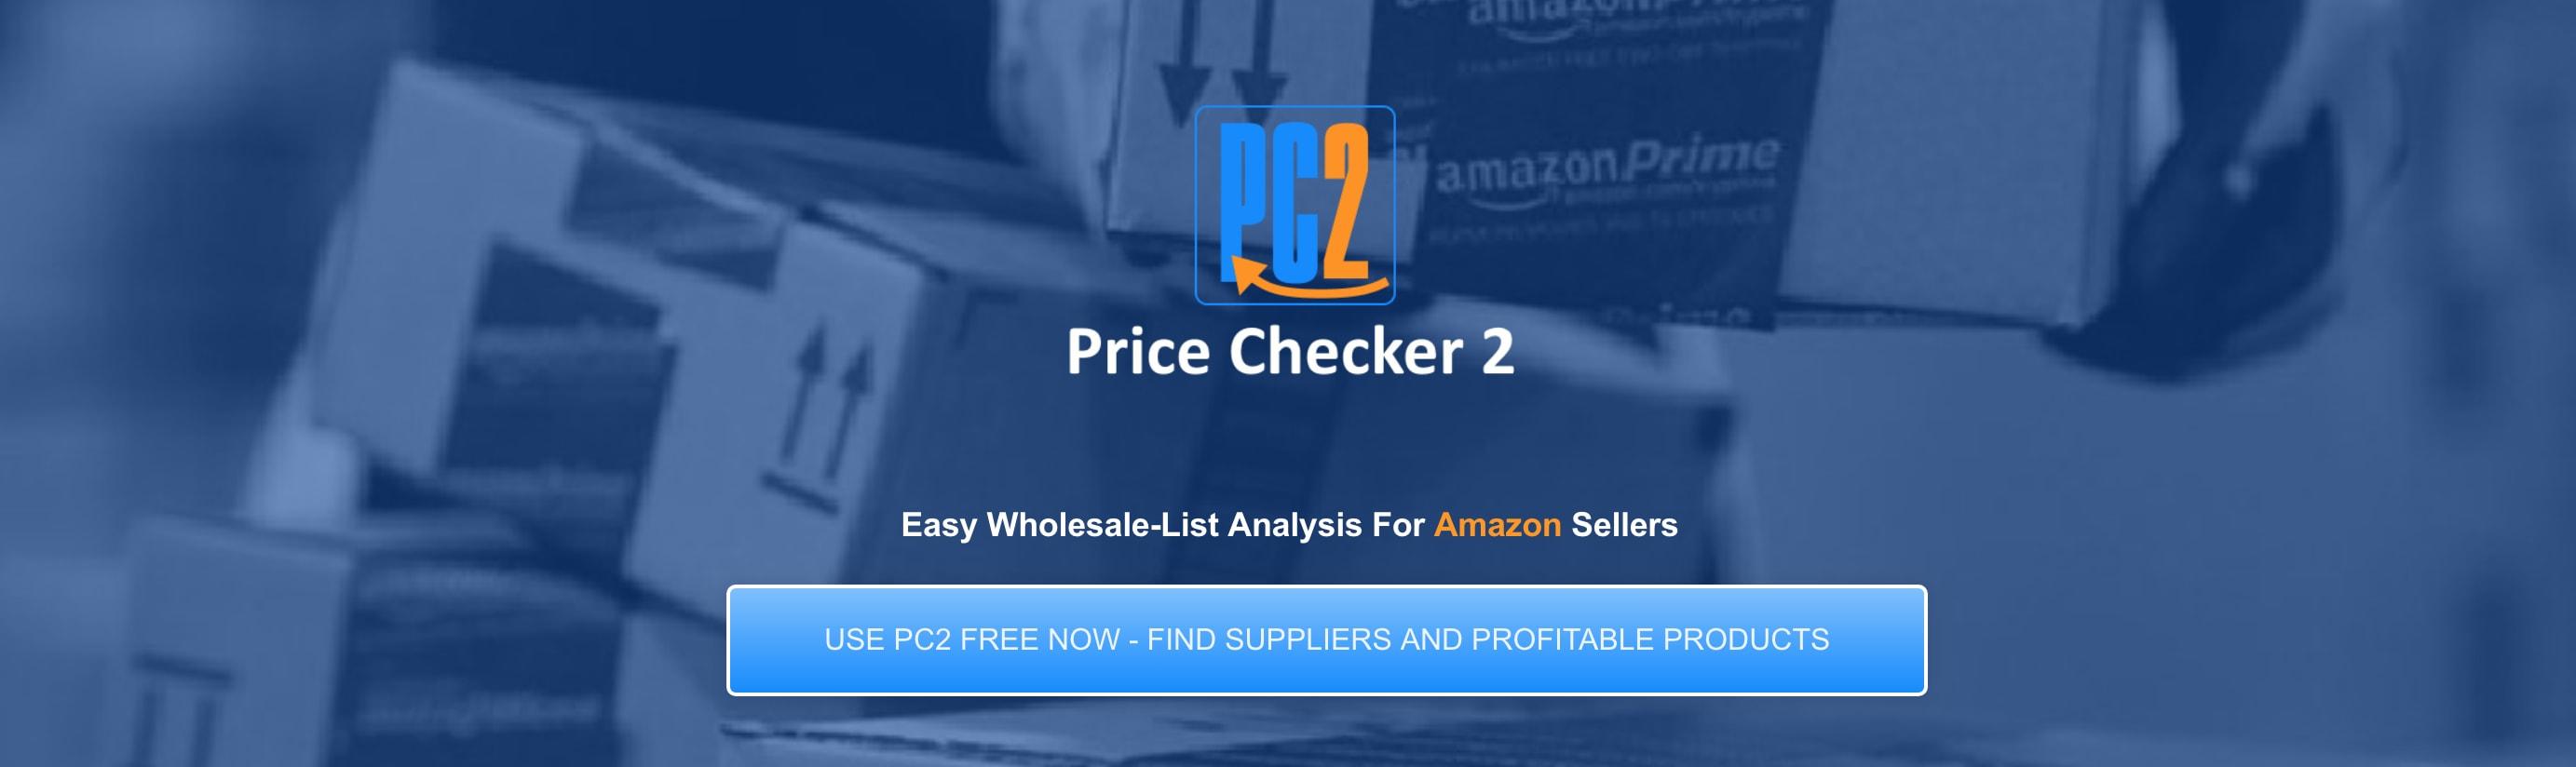 Price Checker 2 screenshot